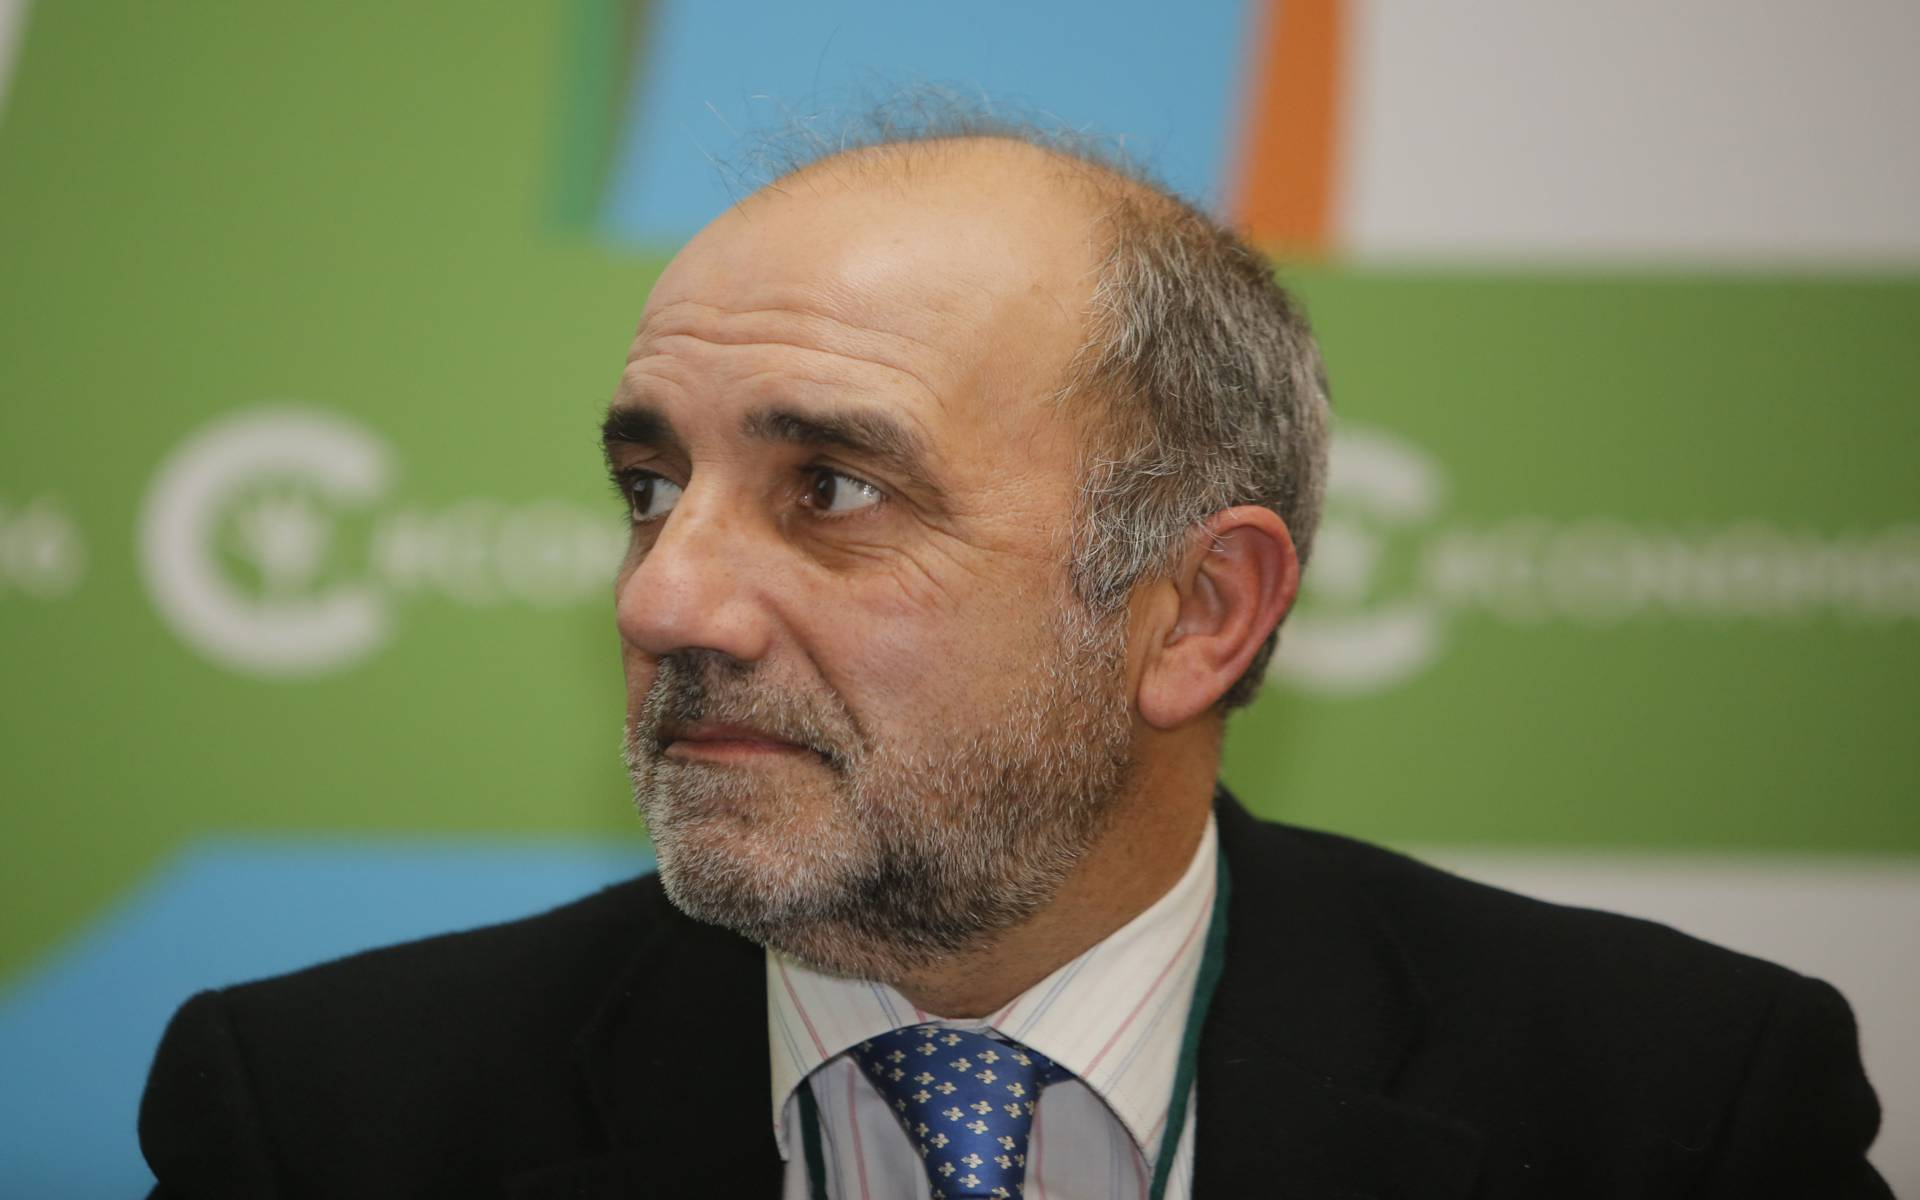 Mauricio Dominguez-Adame